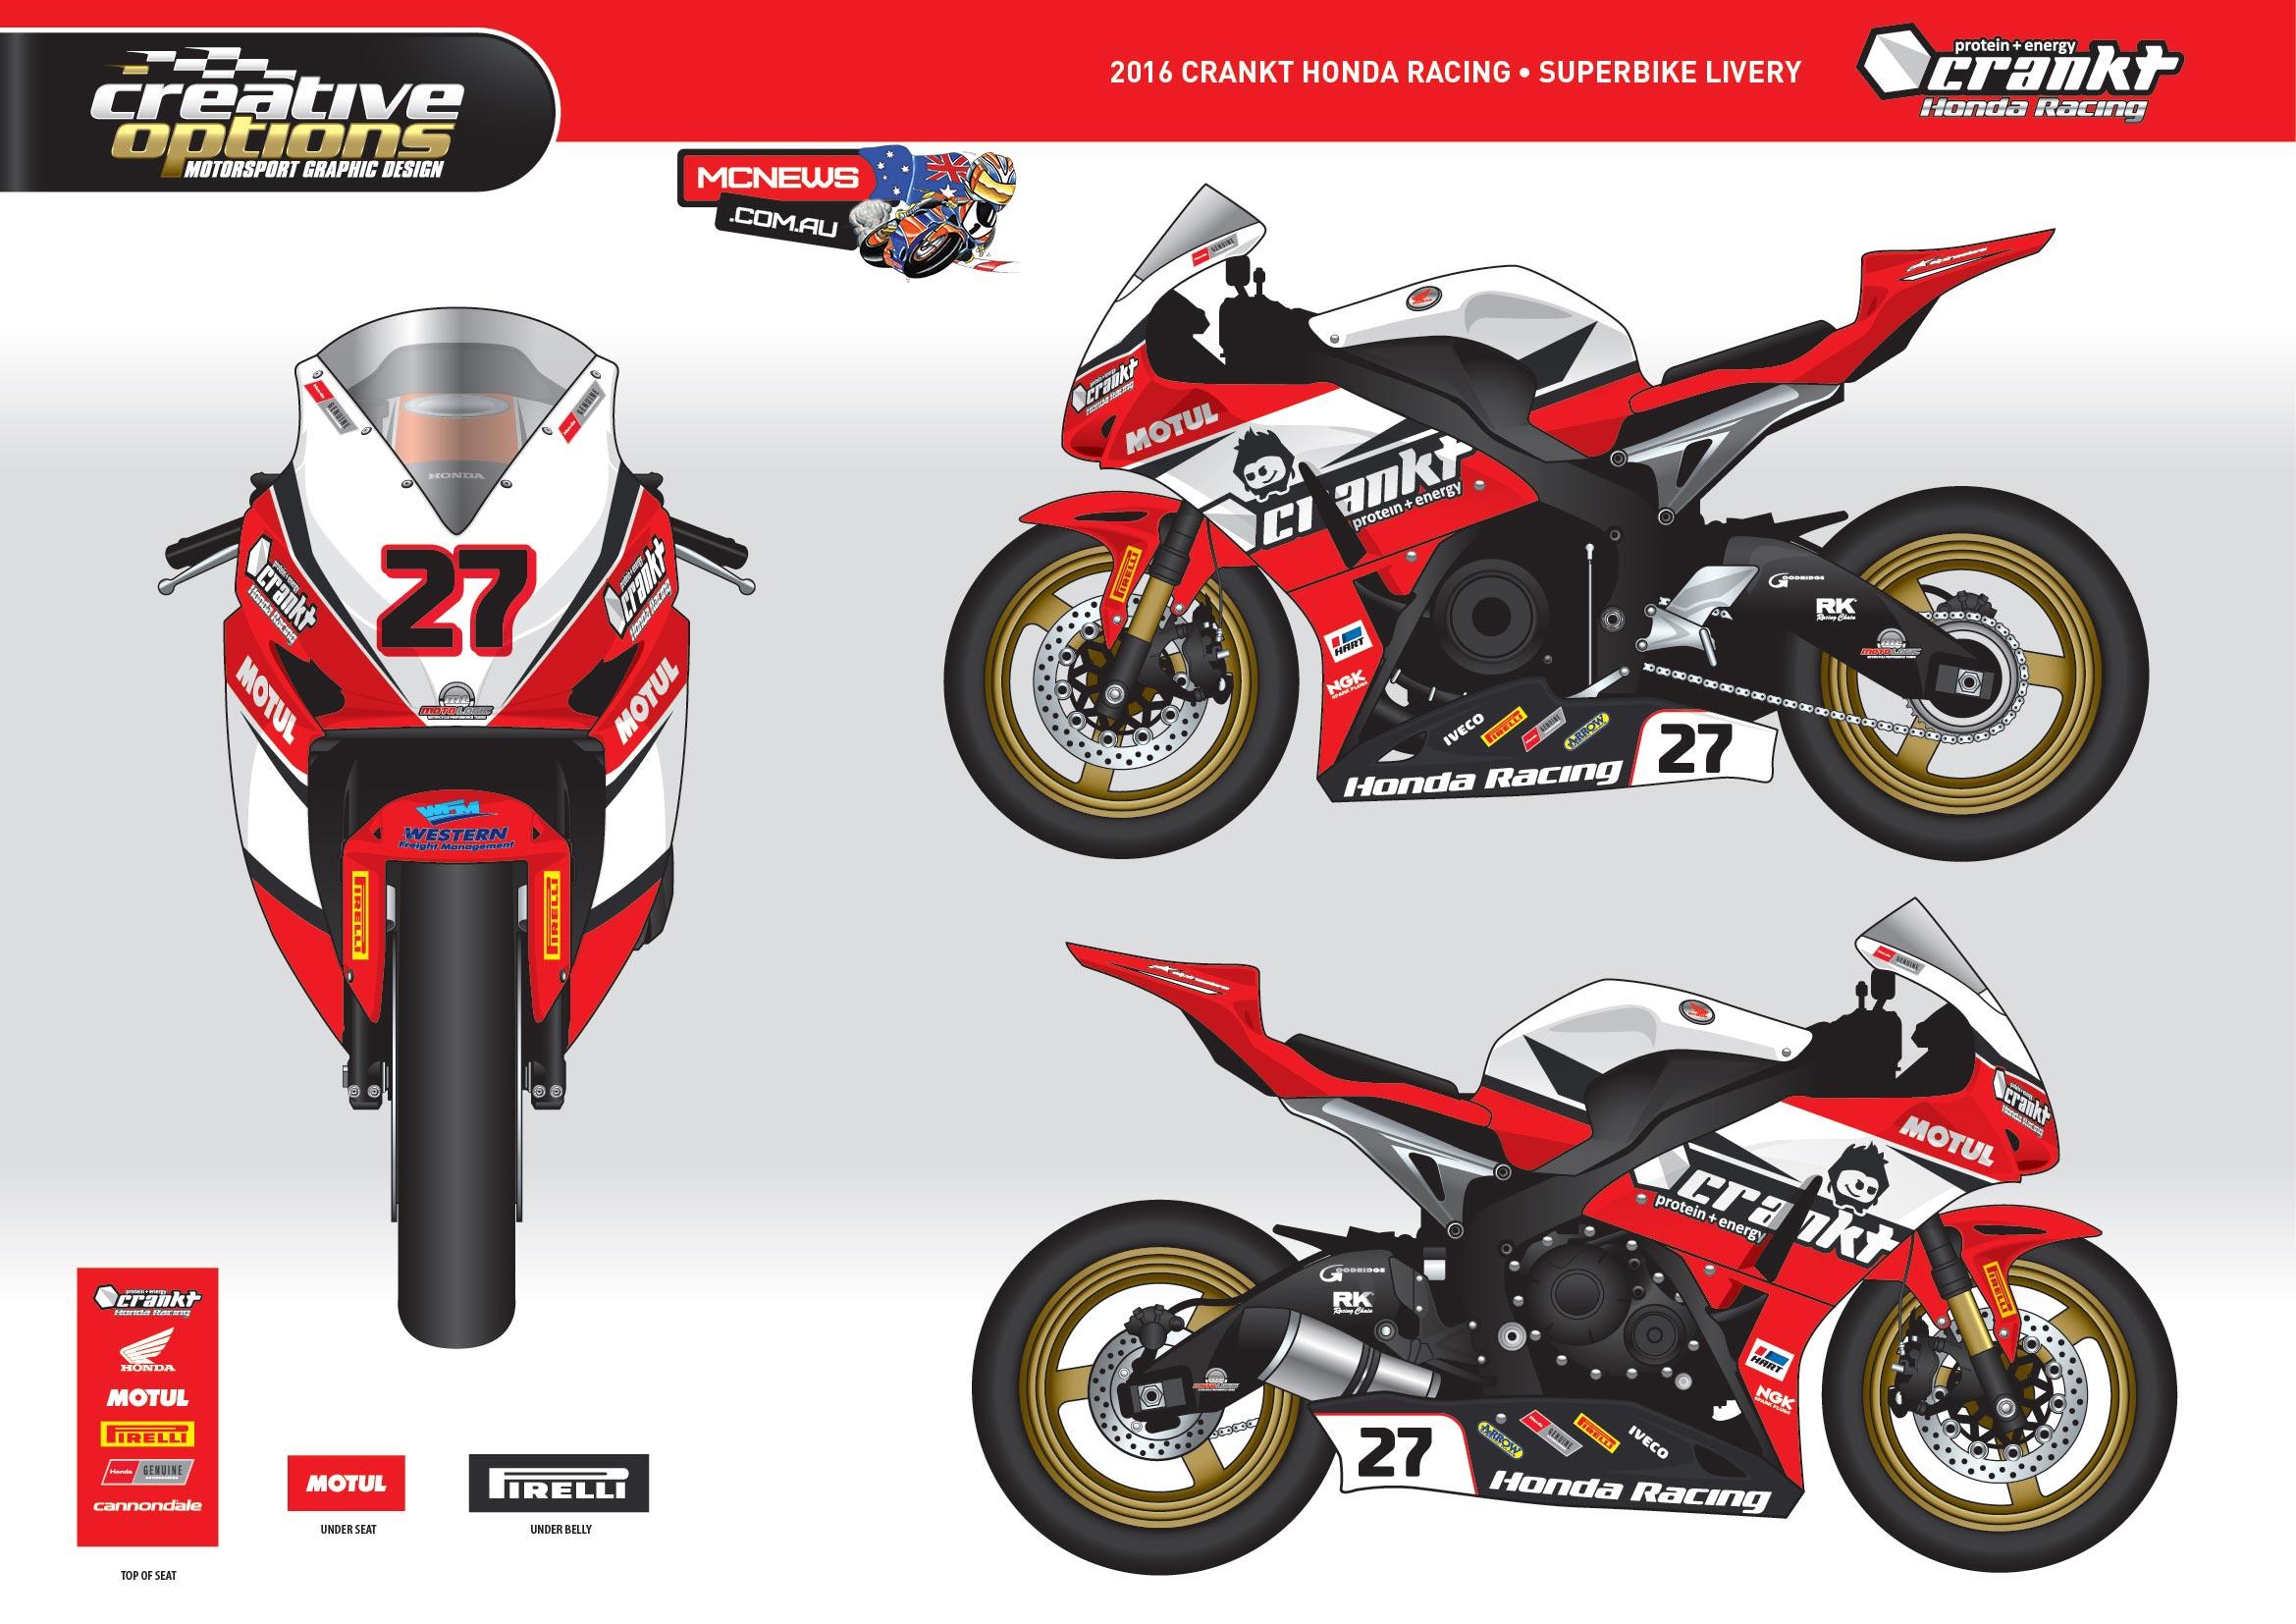 Crankt Team Honda Racing - Superbike Graphics 2016